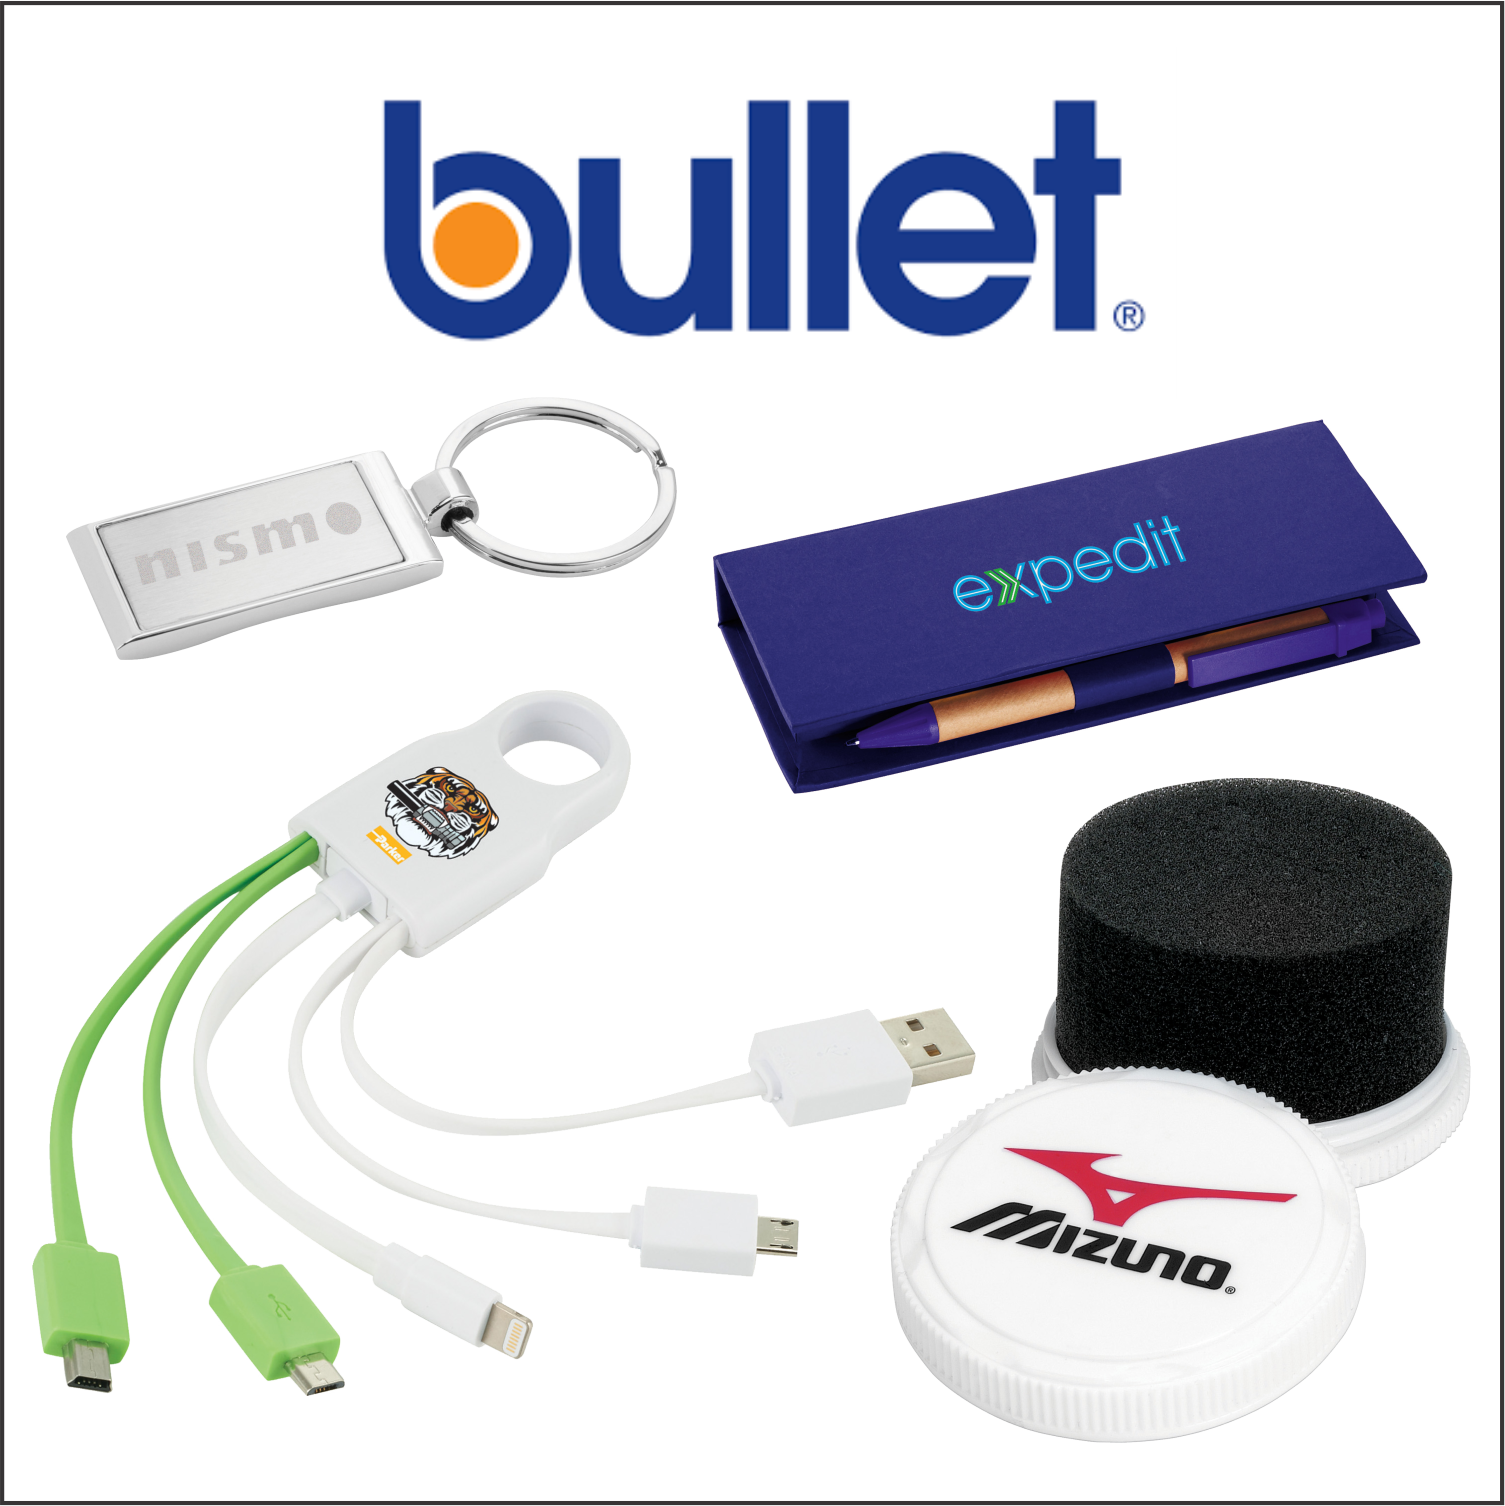 Bullet Button.png